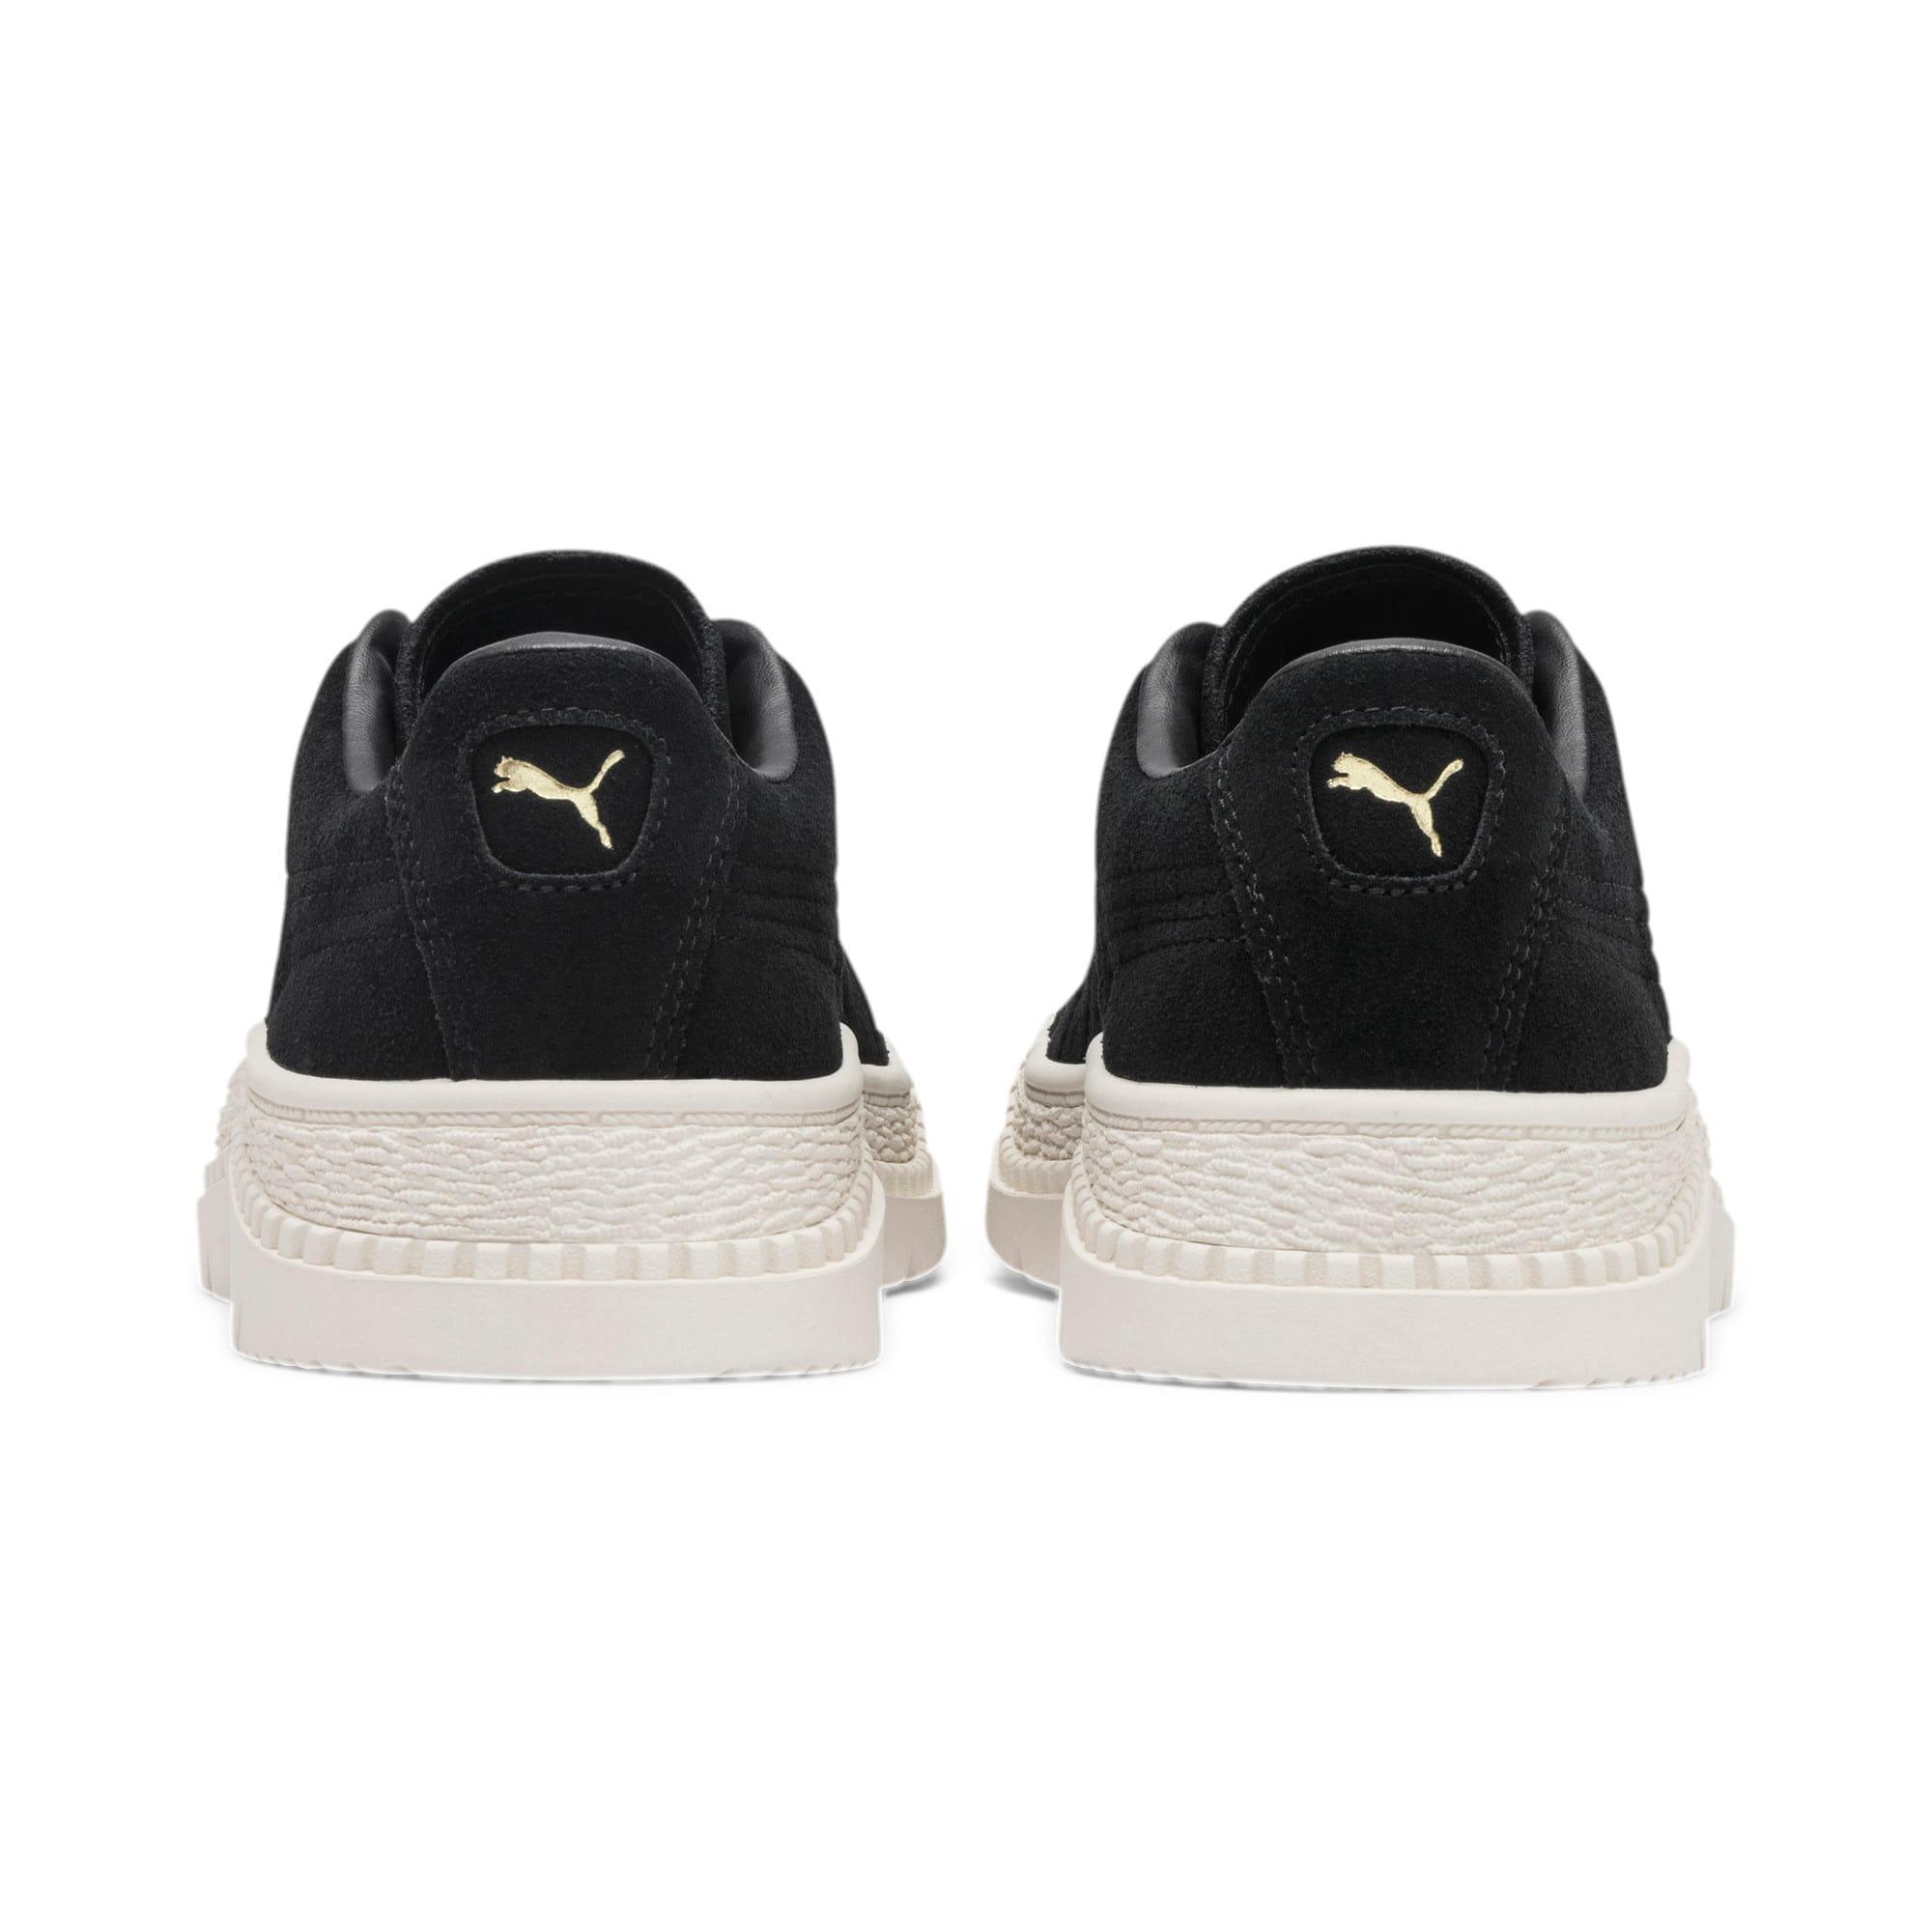 Thumbnail 5 of Utility Suede Women's Sneakers, Puma Black, medium